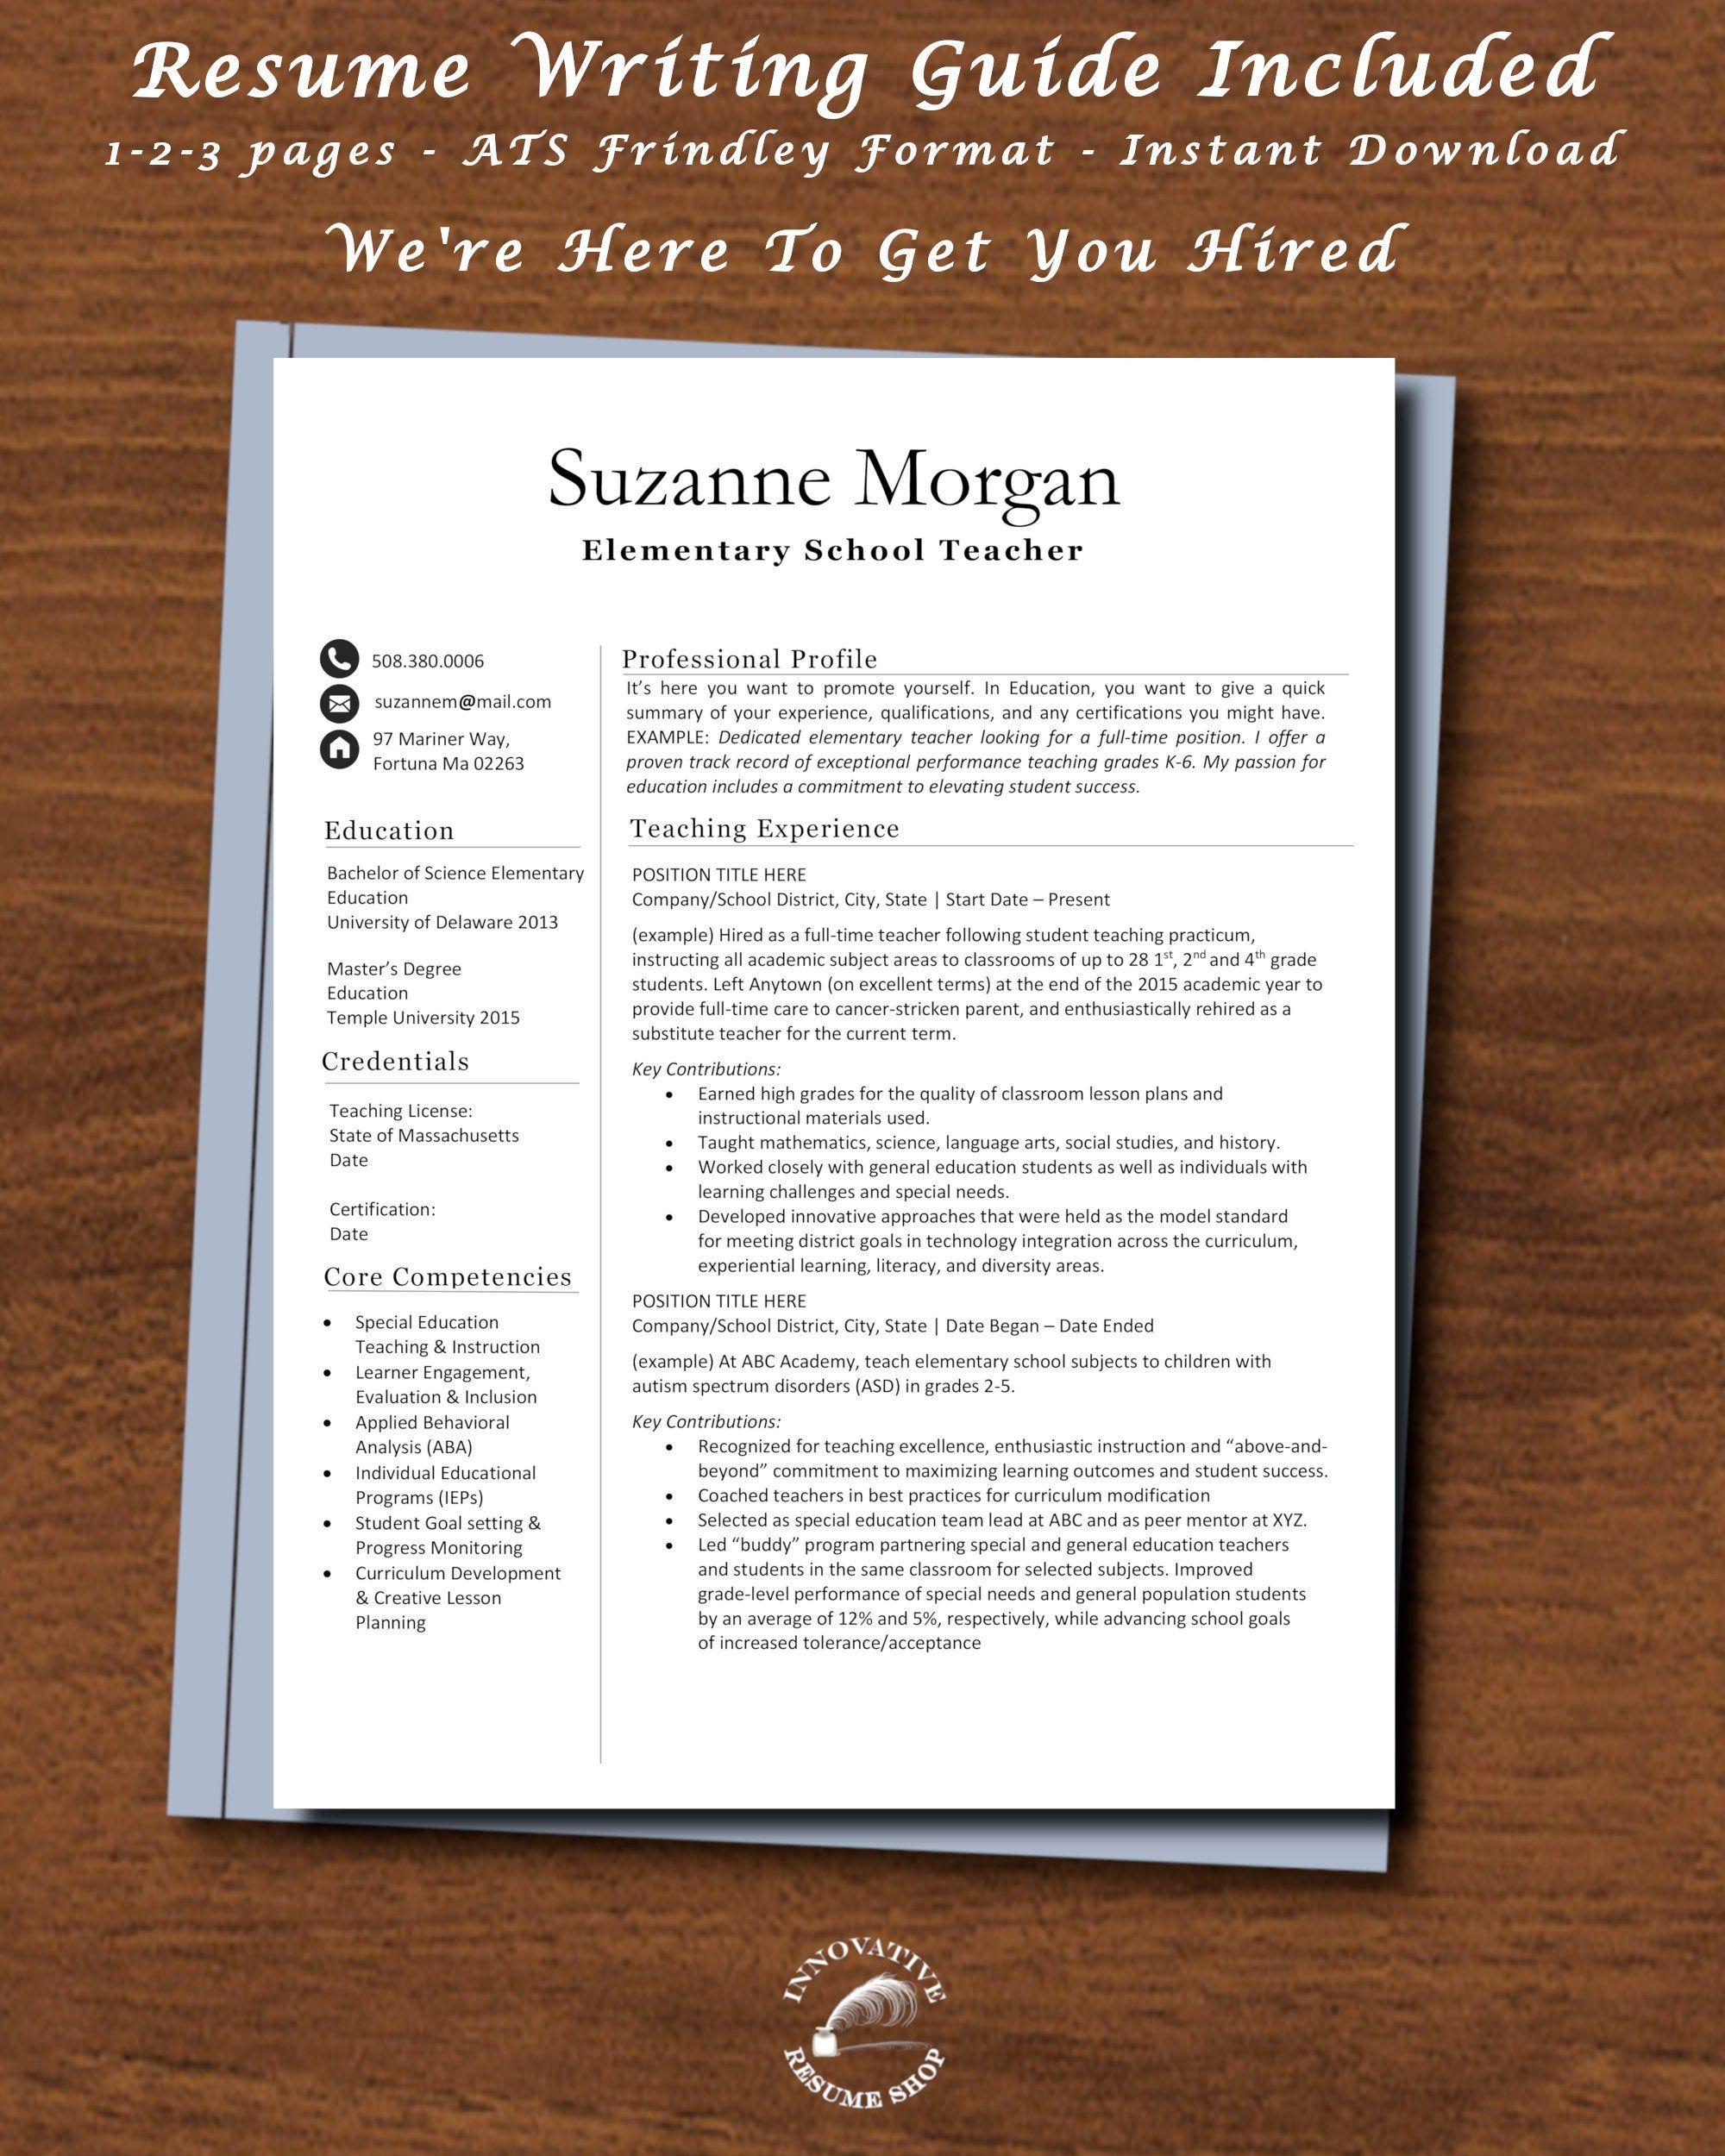 Elementary or preschool teacher resume template with